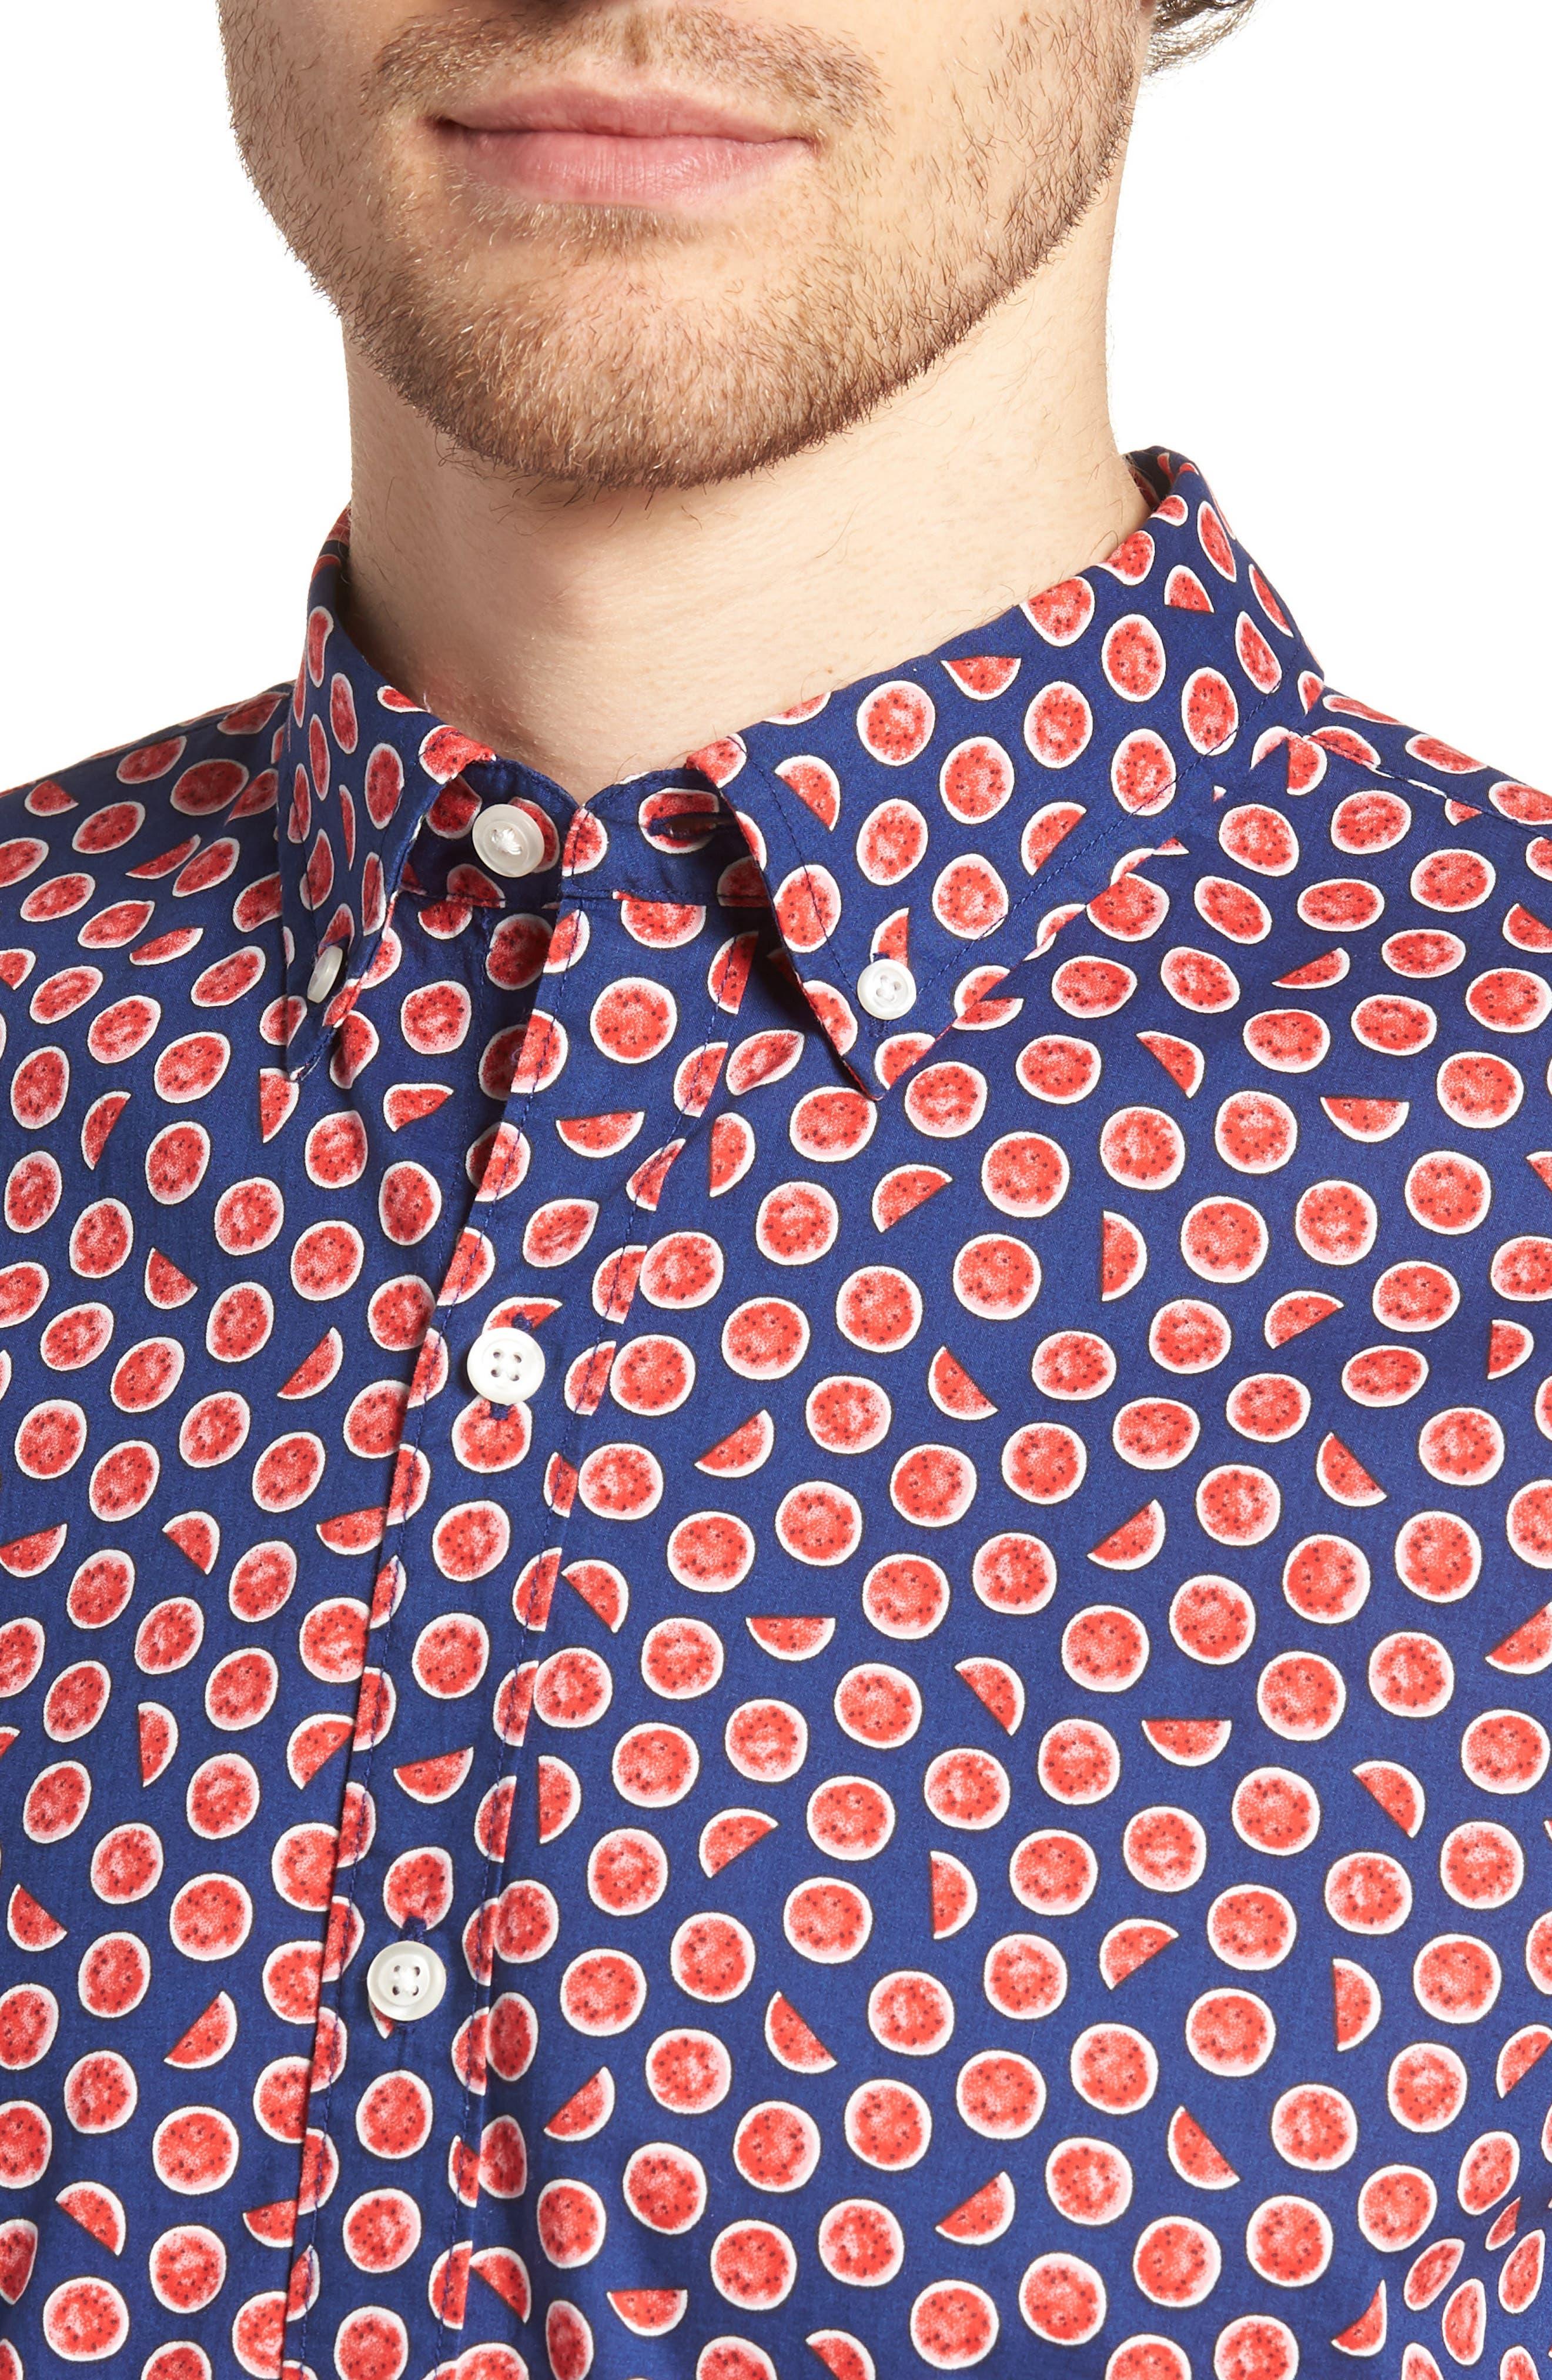 Riviera Slim Fit Watermelon Print Sport Shirt,                             Alternate thumbnail 4, color,                             WATERMELON - GOJI BERRY